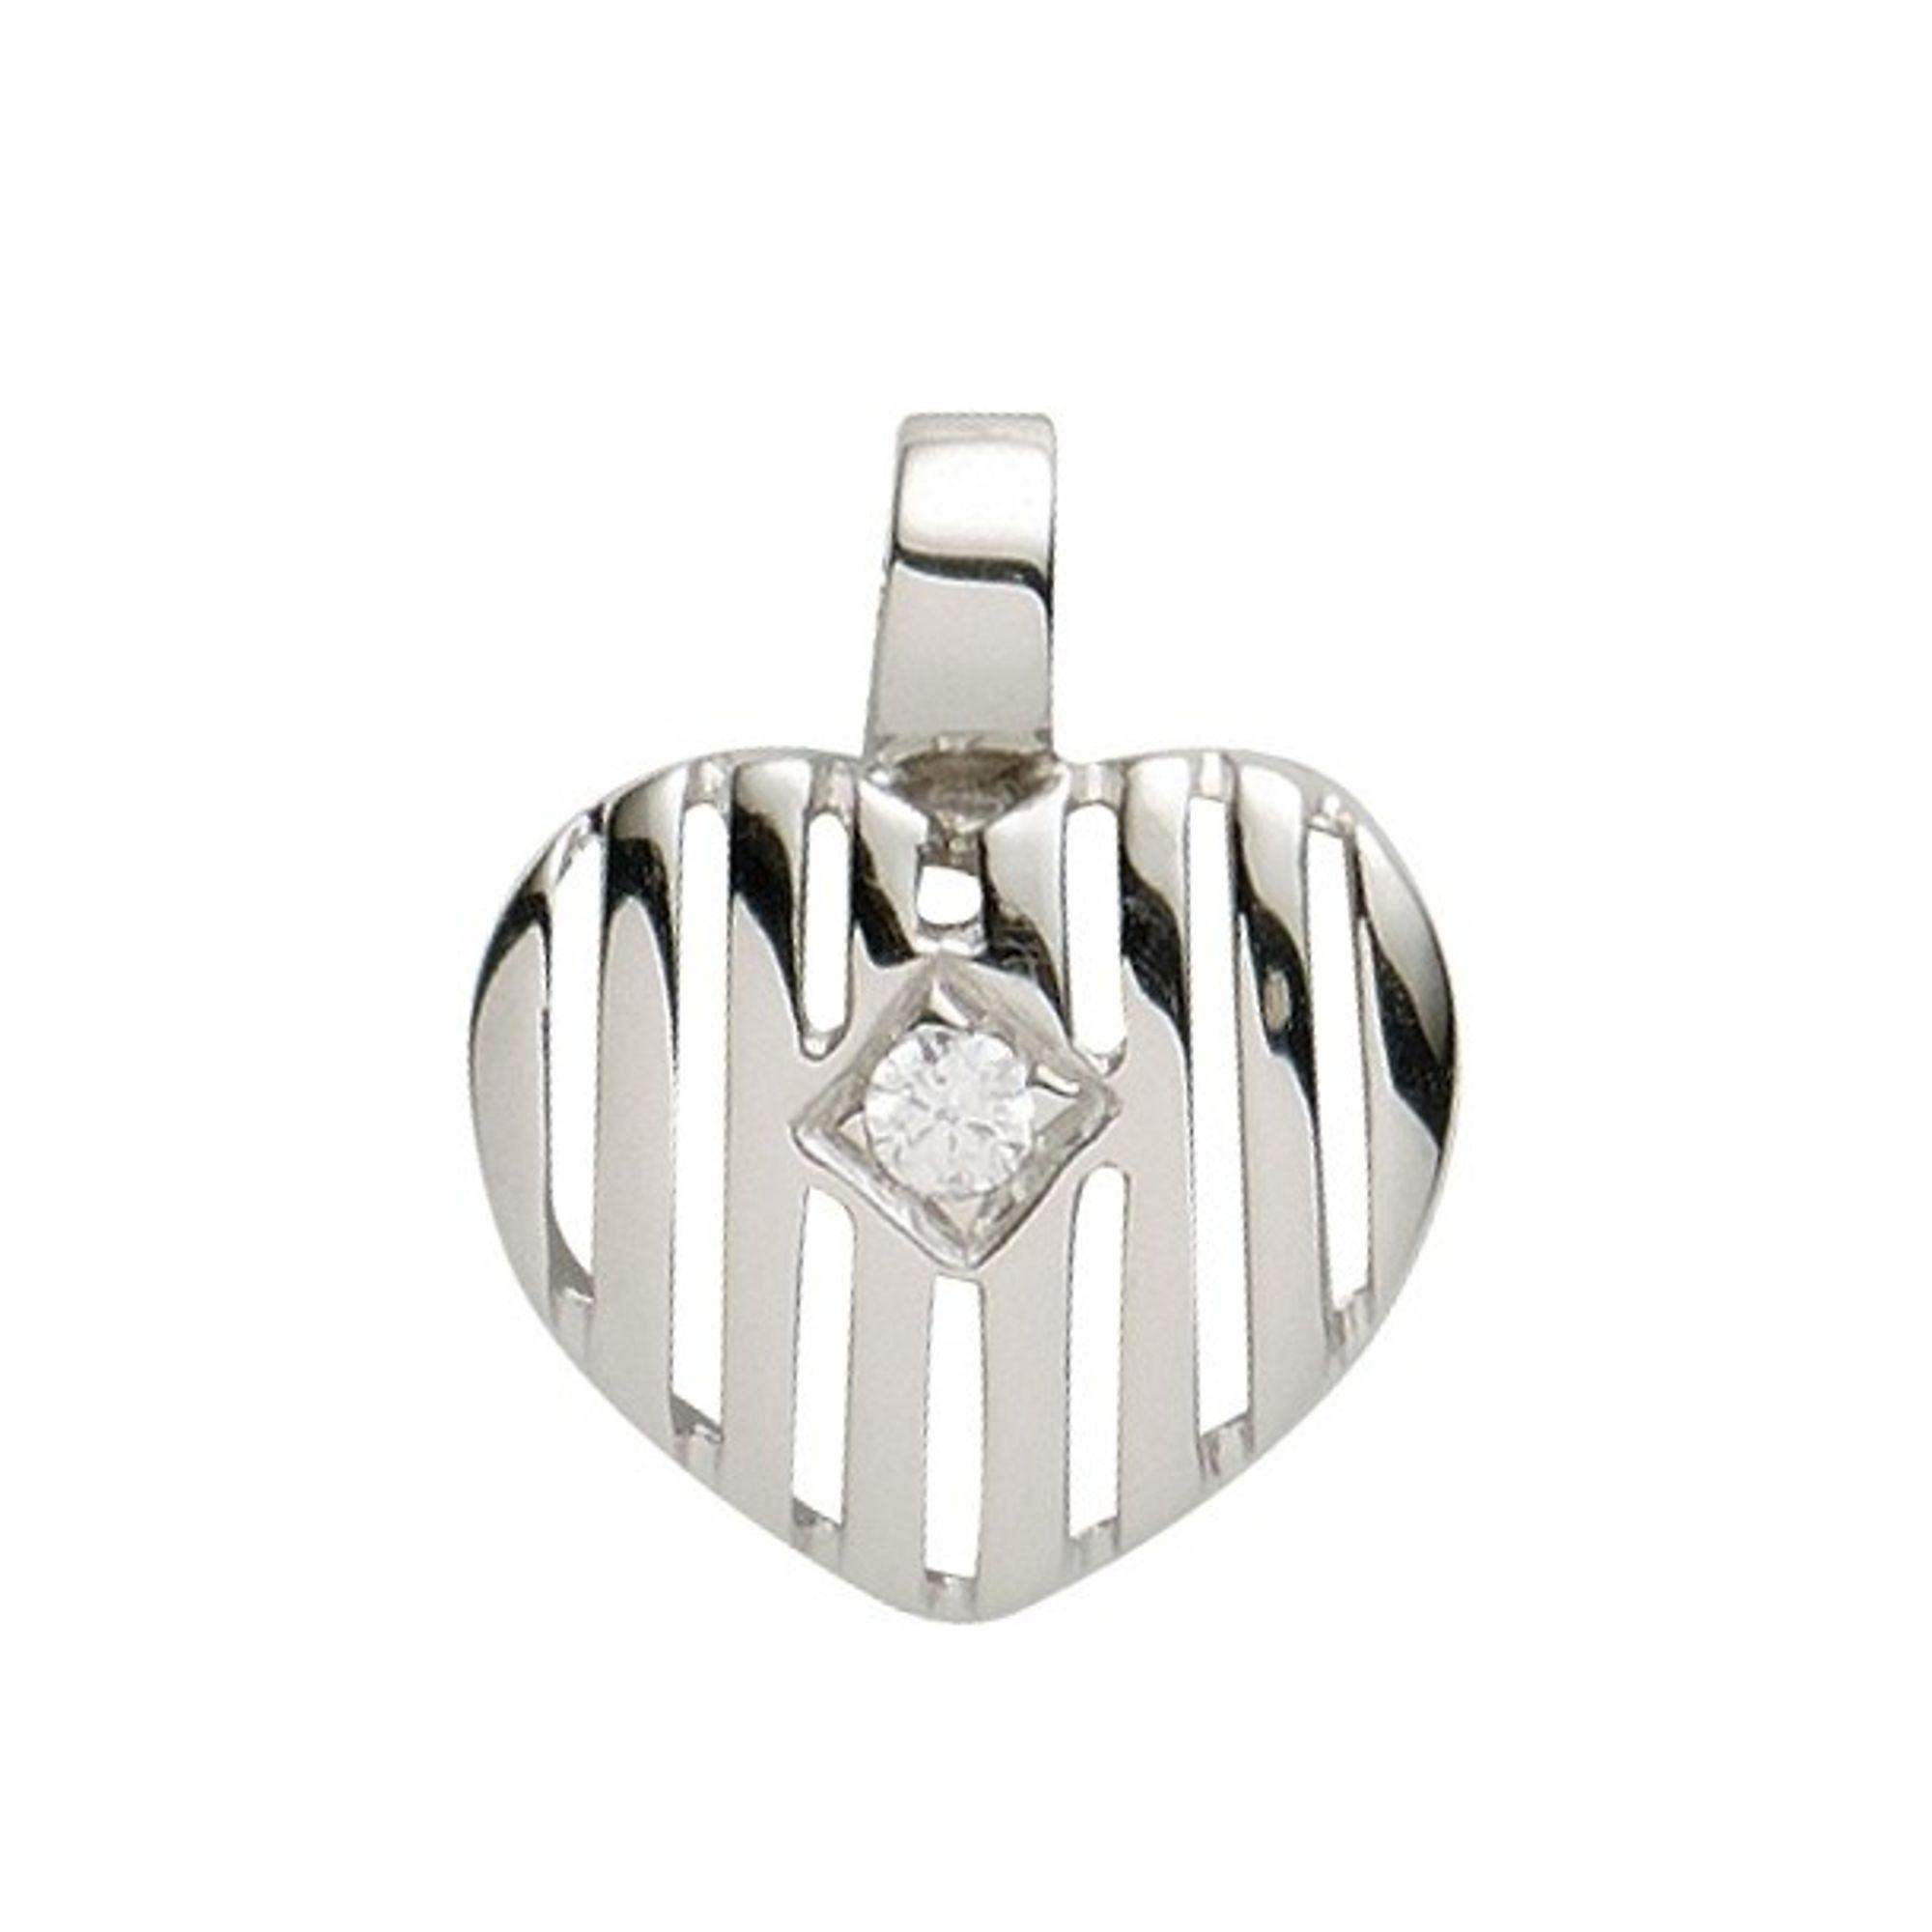 Basic Silber 21.1125S Damen Anhänger Herz Silber Zirkonia weiß